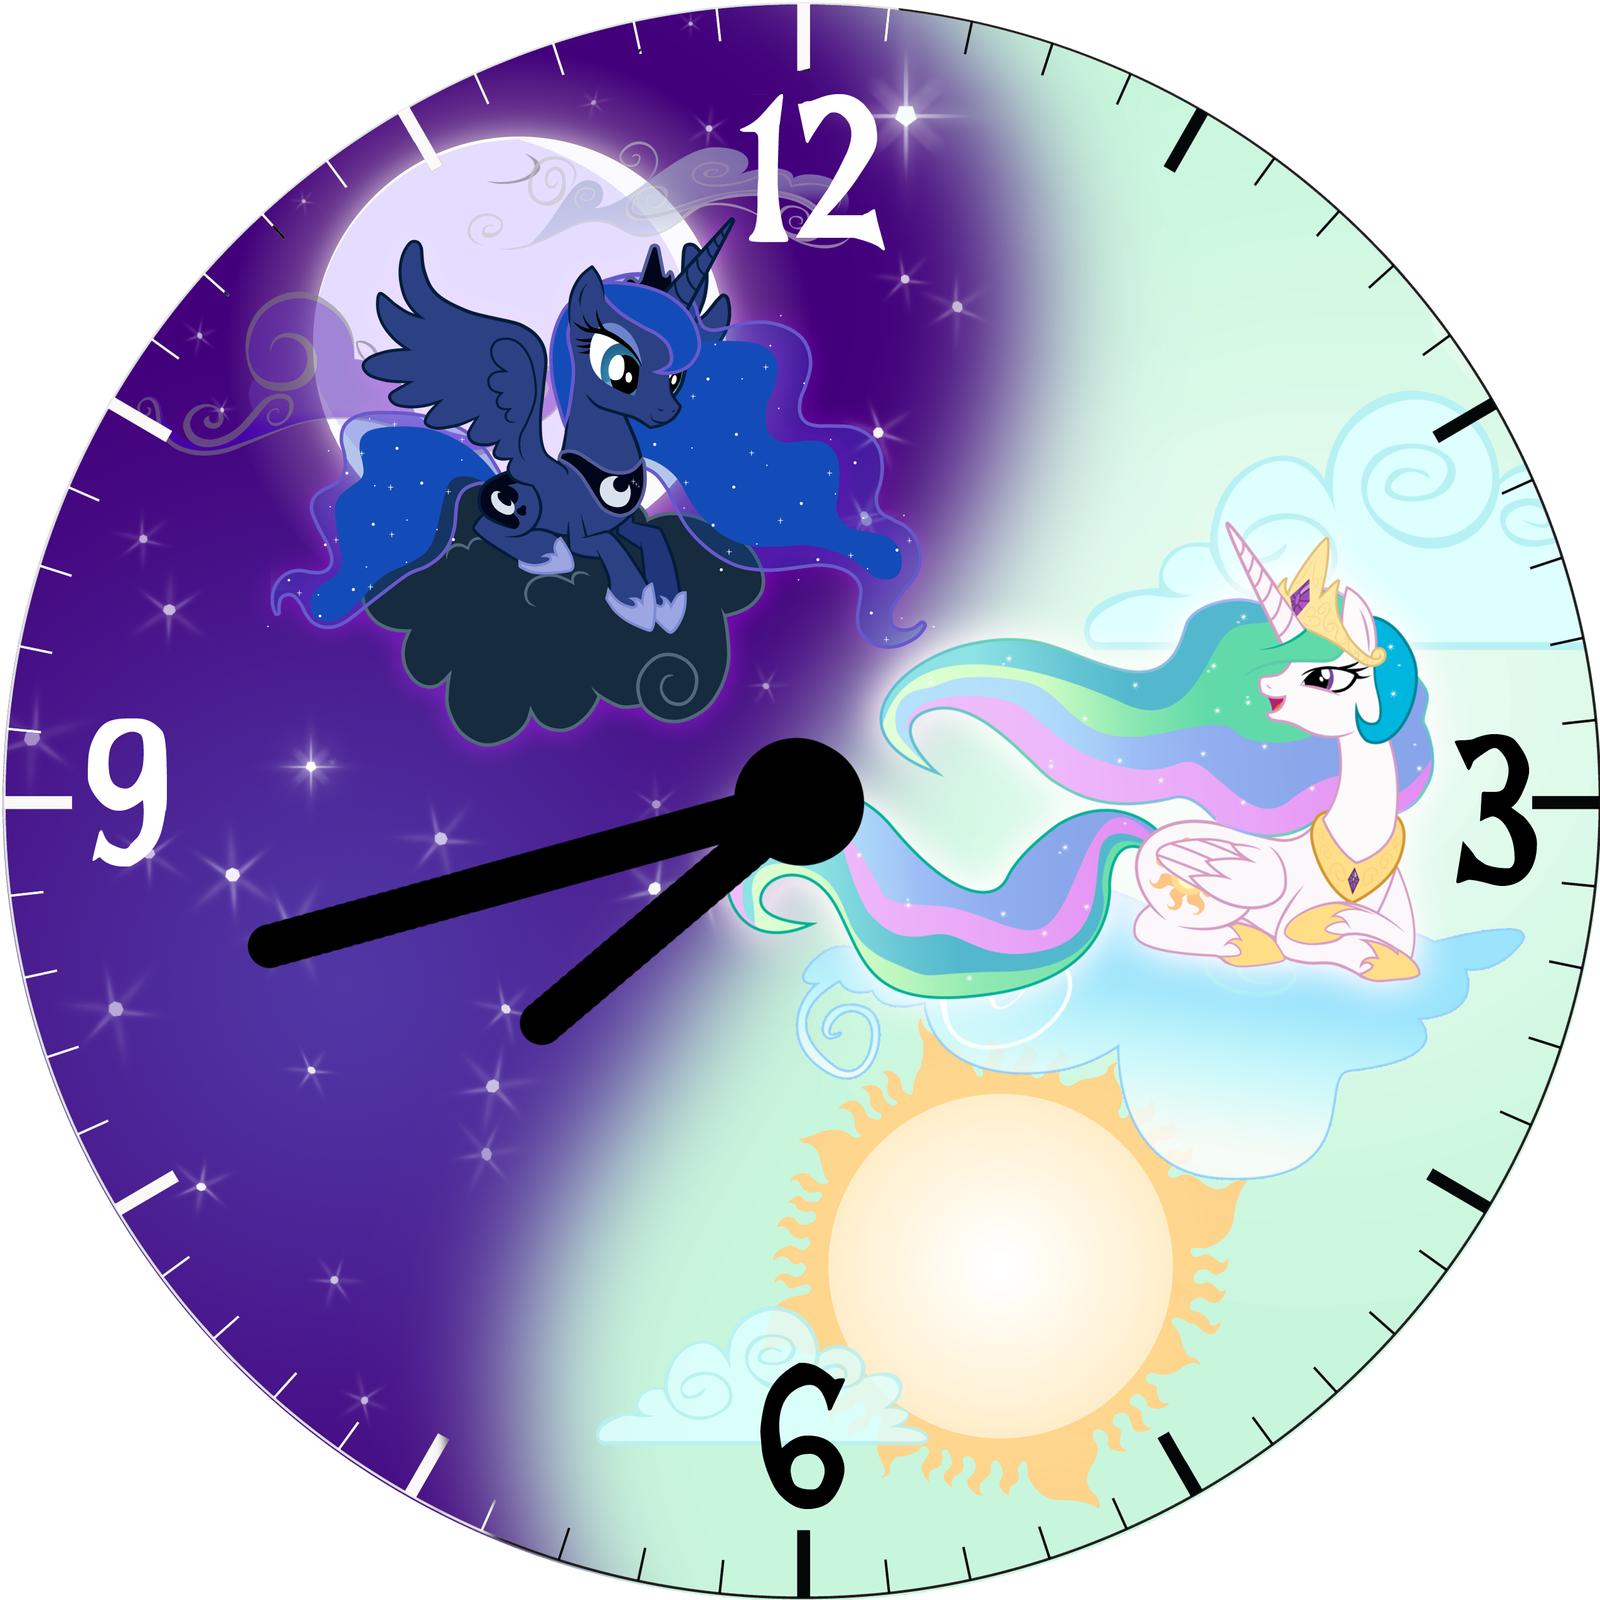 Luna And Celestia Wall Clock Face By Trebory6 On Deviantart